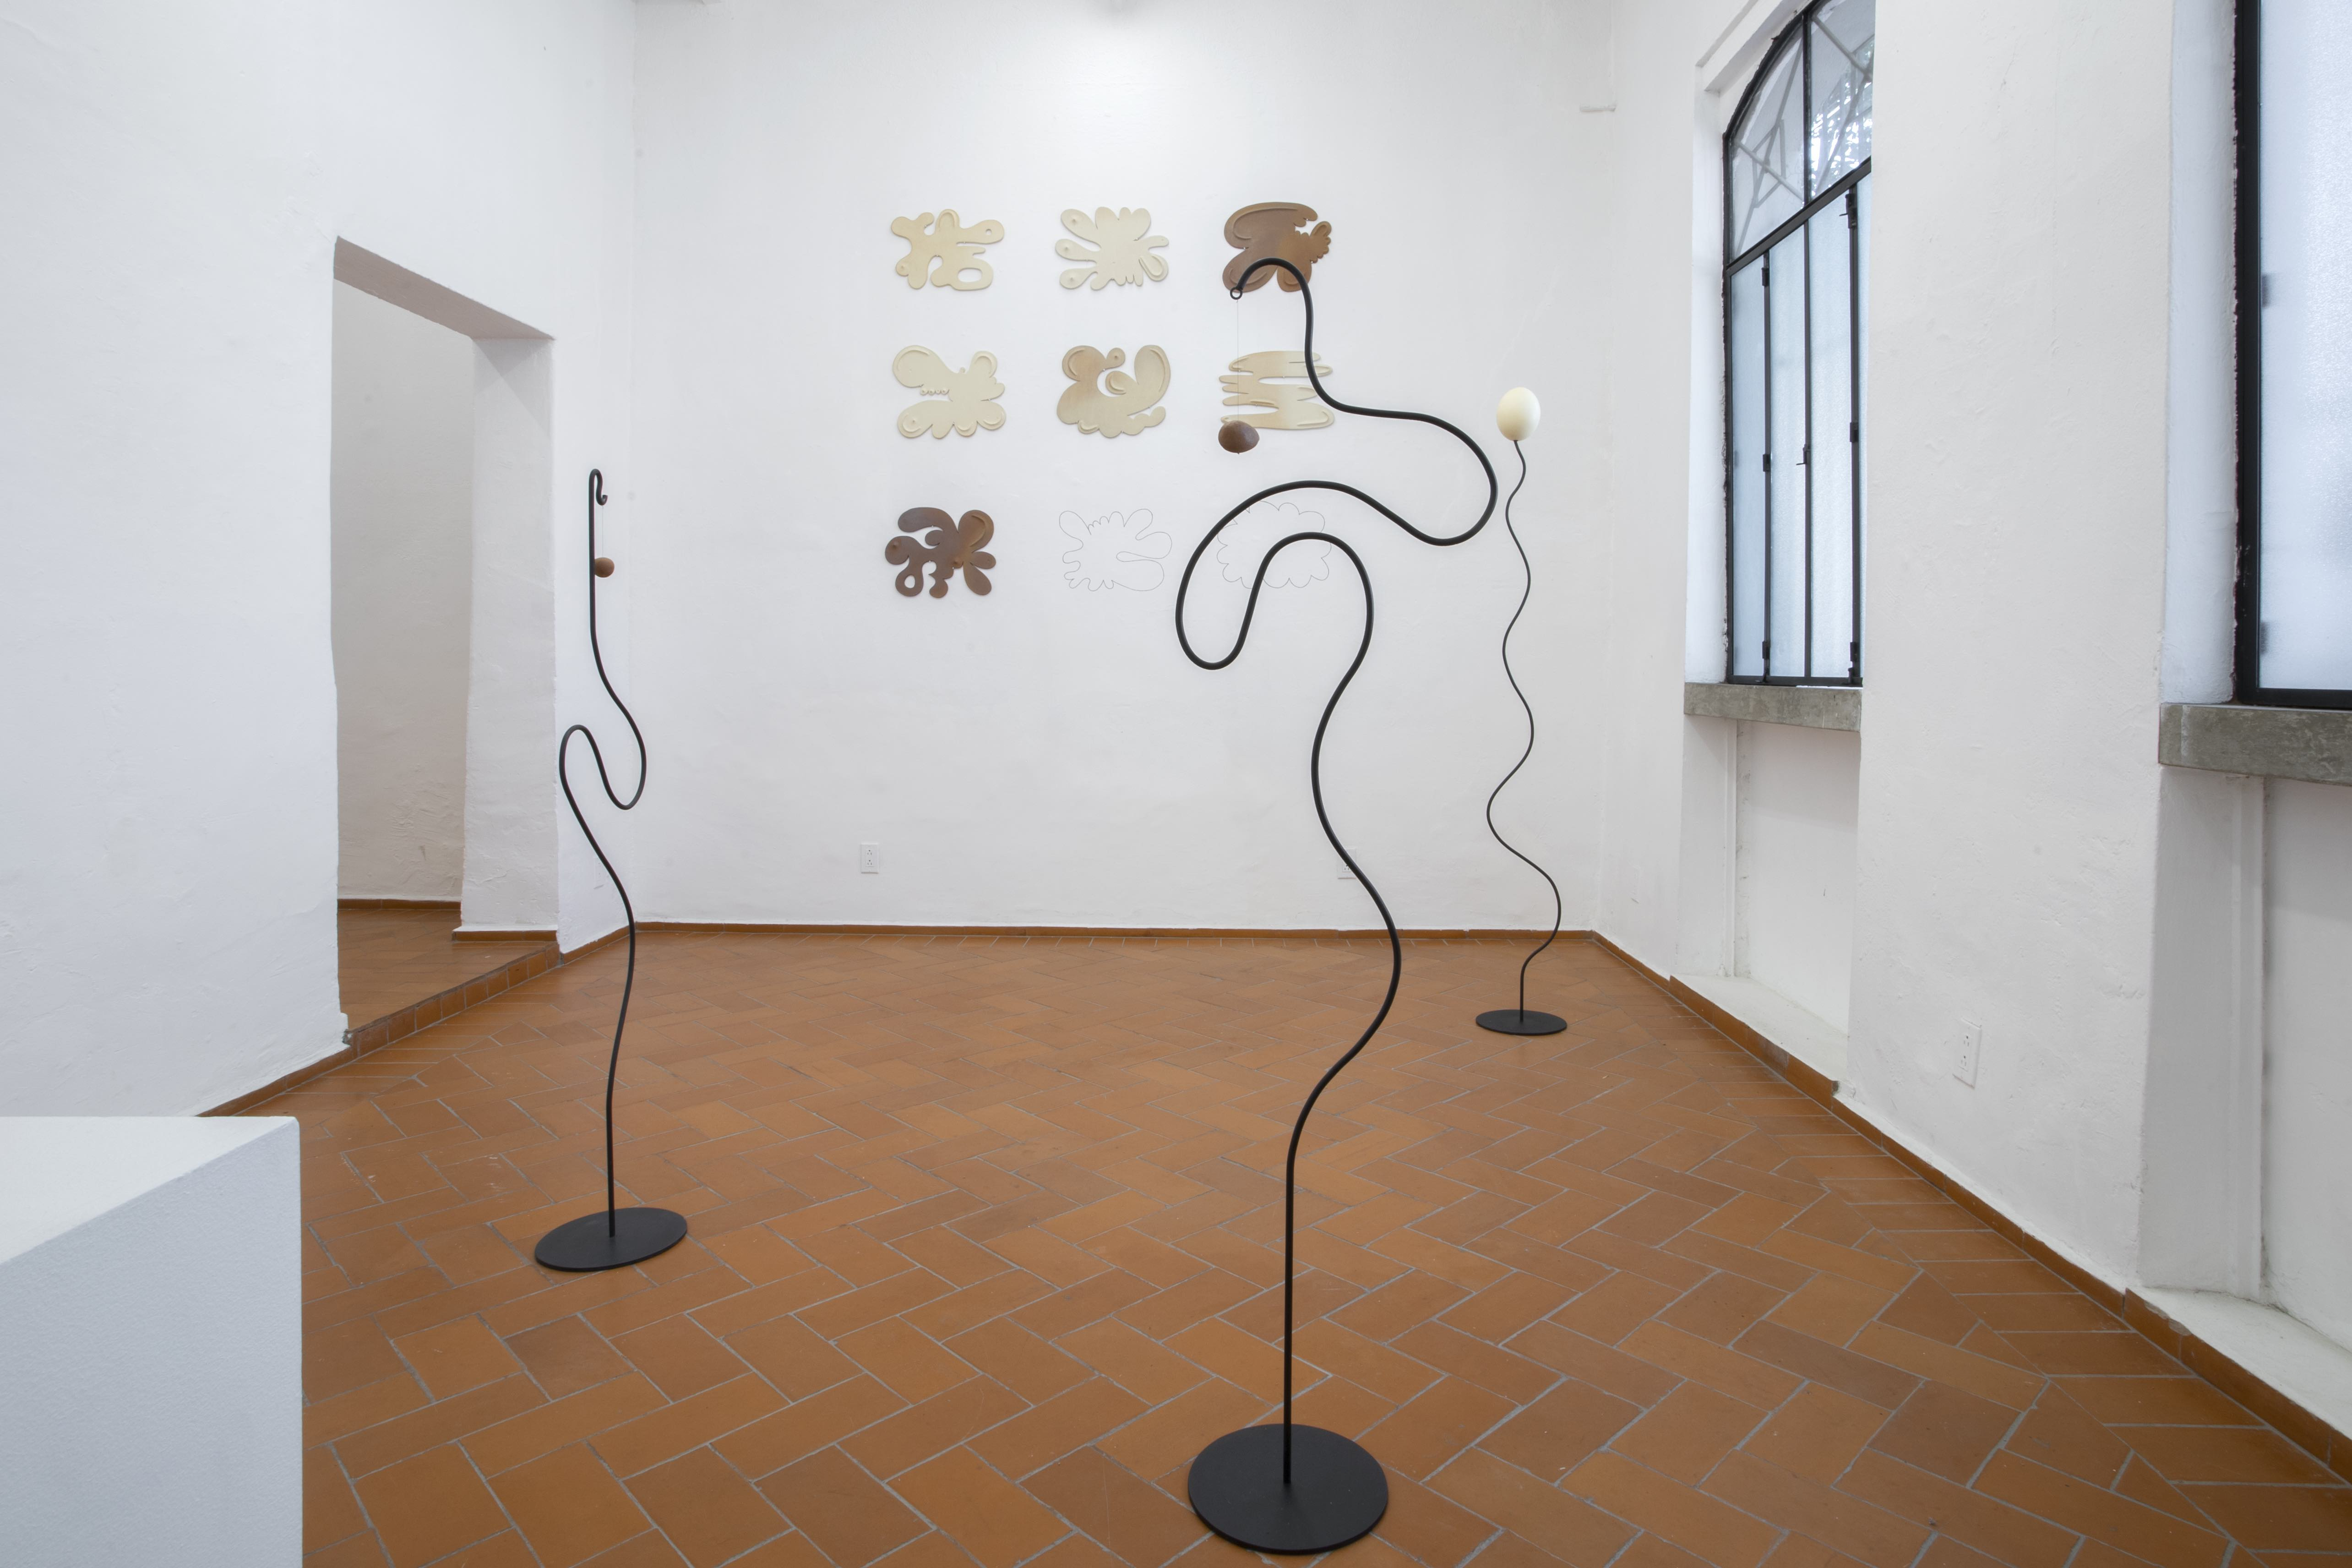 Exhibition view for Jardín, Natalia Ramos, guadalajara90210, 2021. Courtesy of the artist